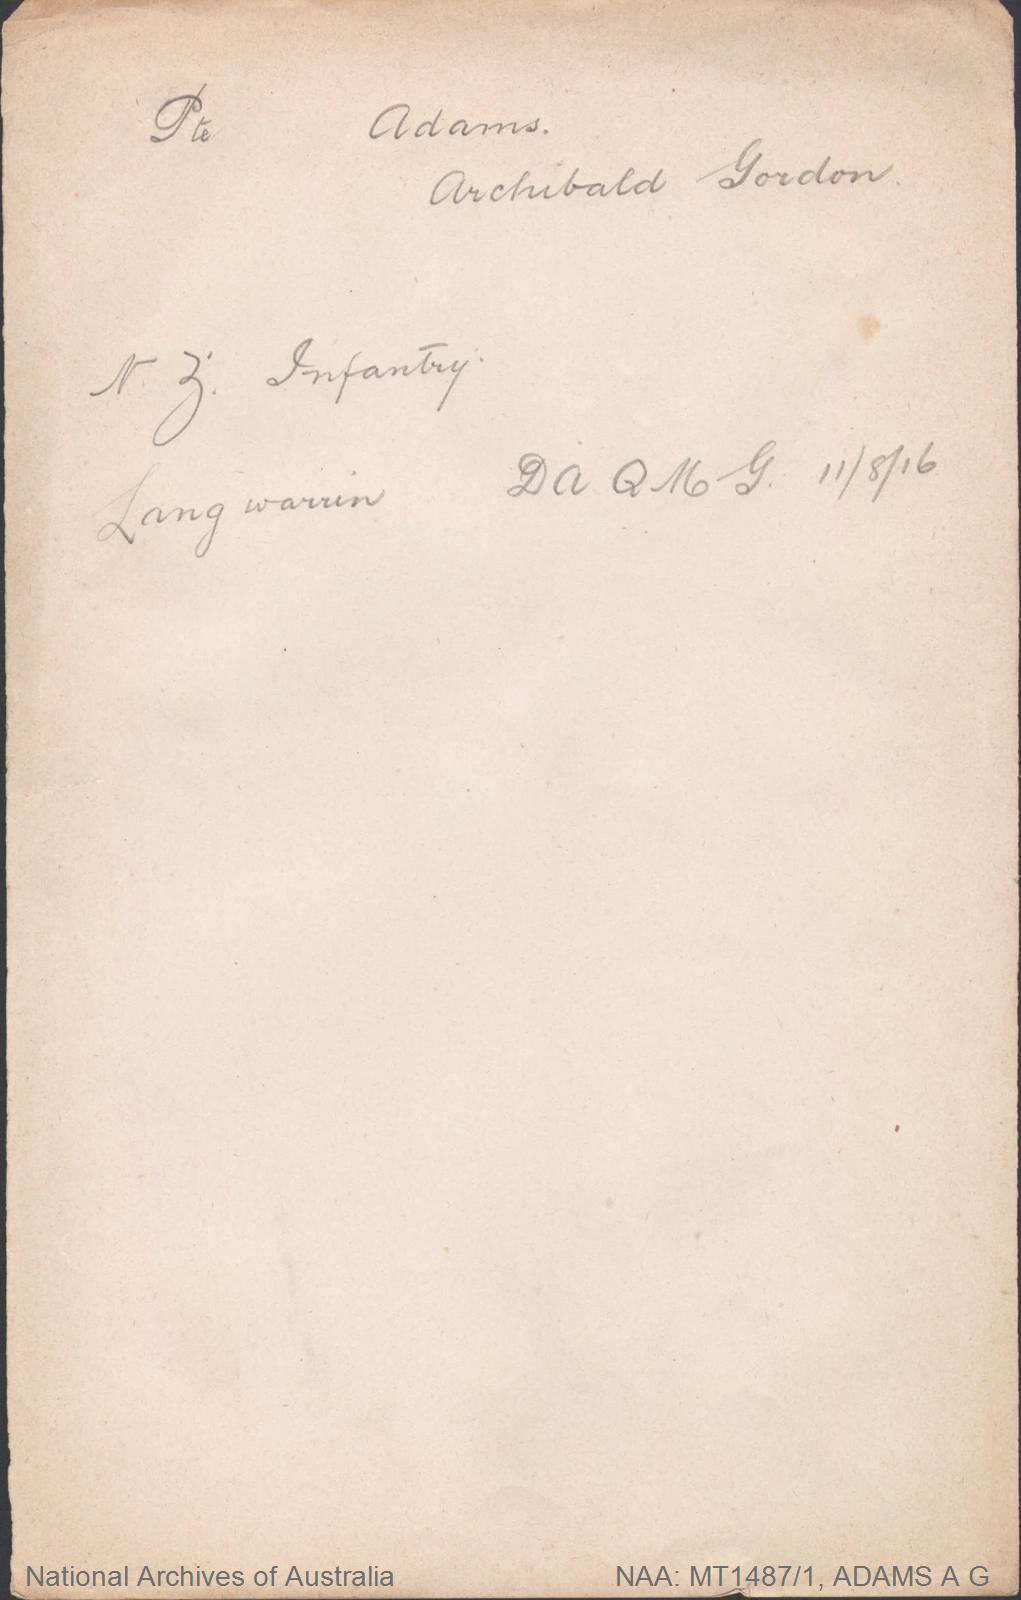 ADAMS Archibald Gordon (Pte) - NZ Infantry